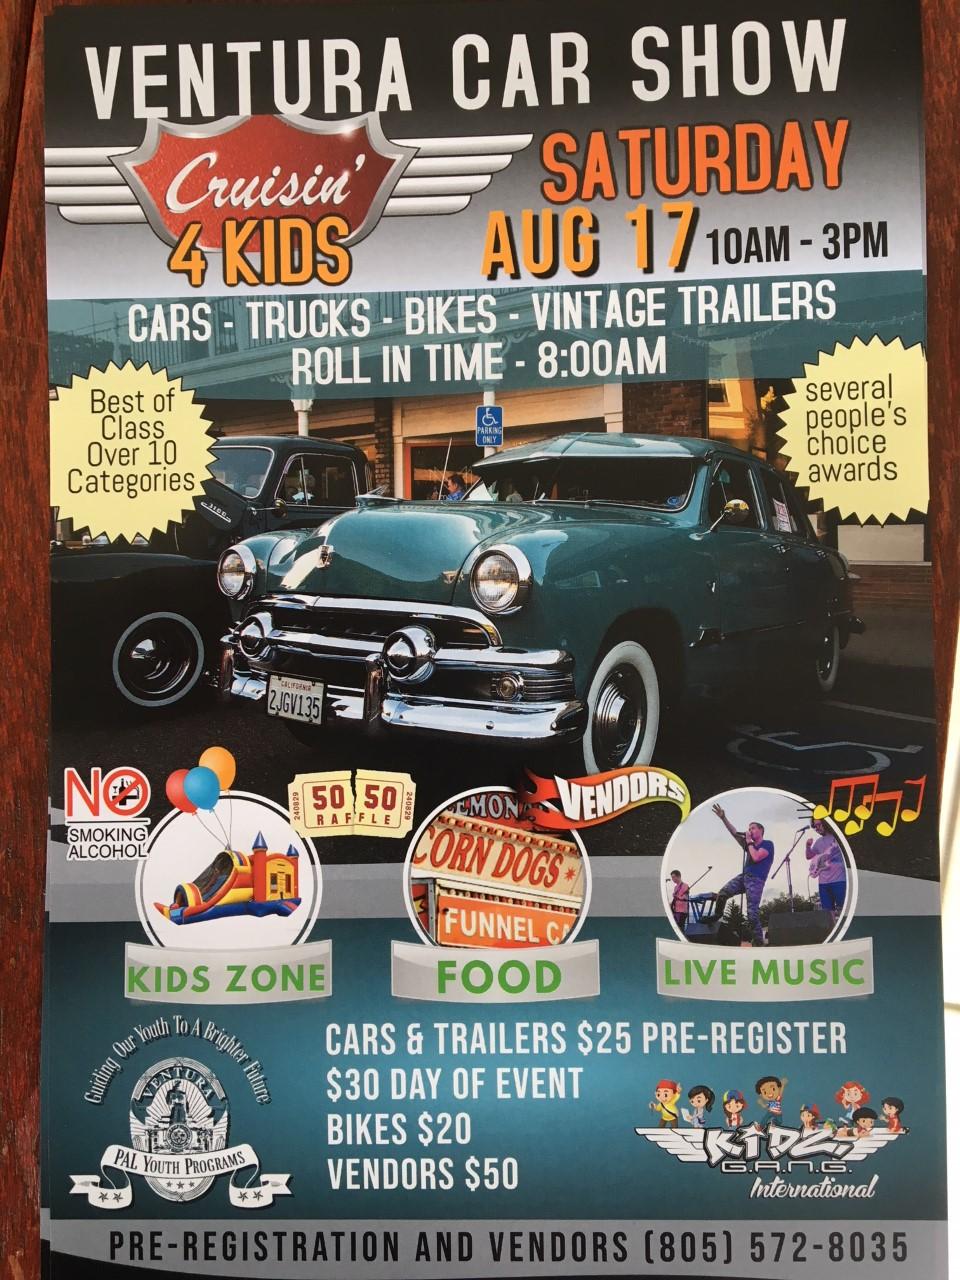 Ventura Car Show - Cruisin 4 Kids